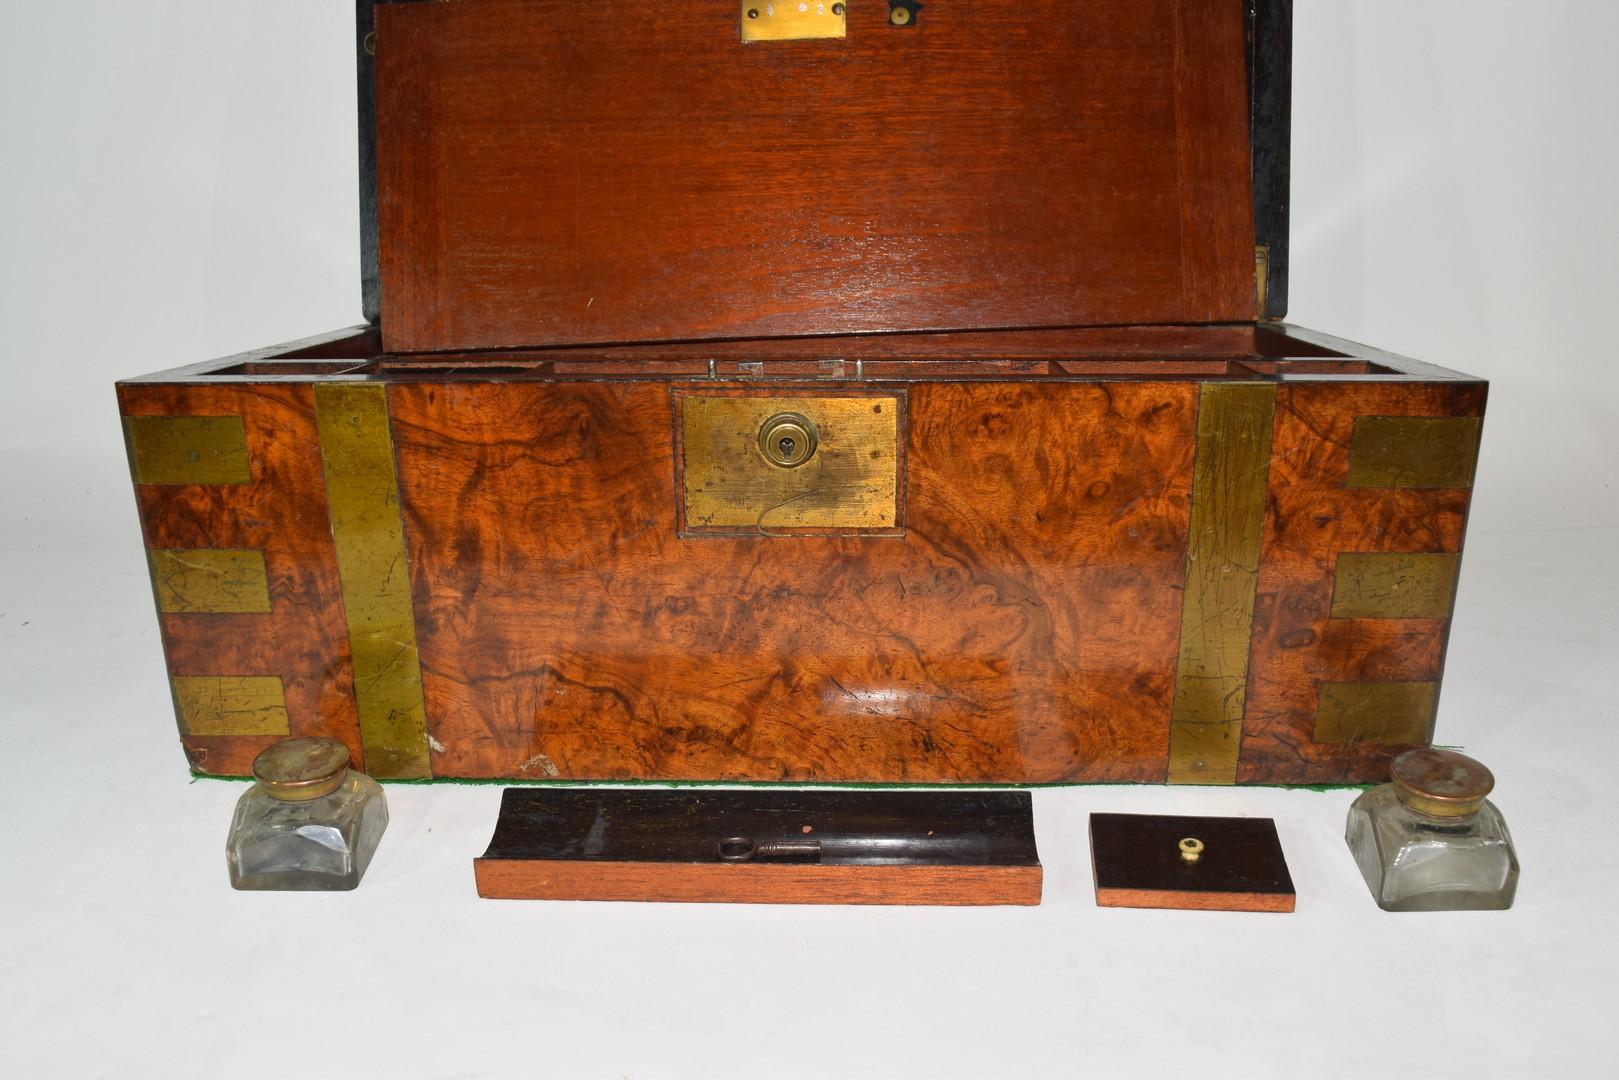 Victorian walnut veneered and brass mounted writing box - Image 9 of 10